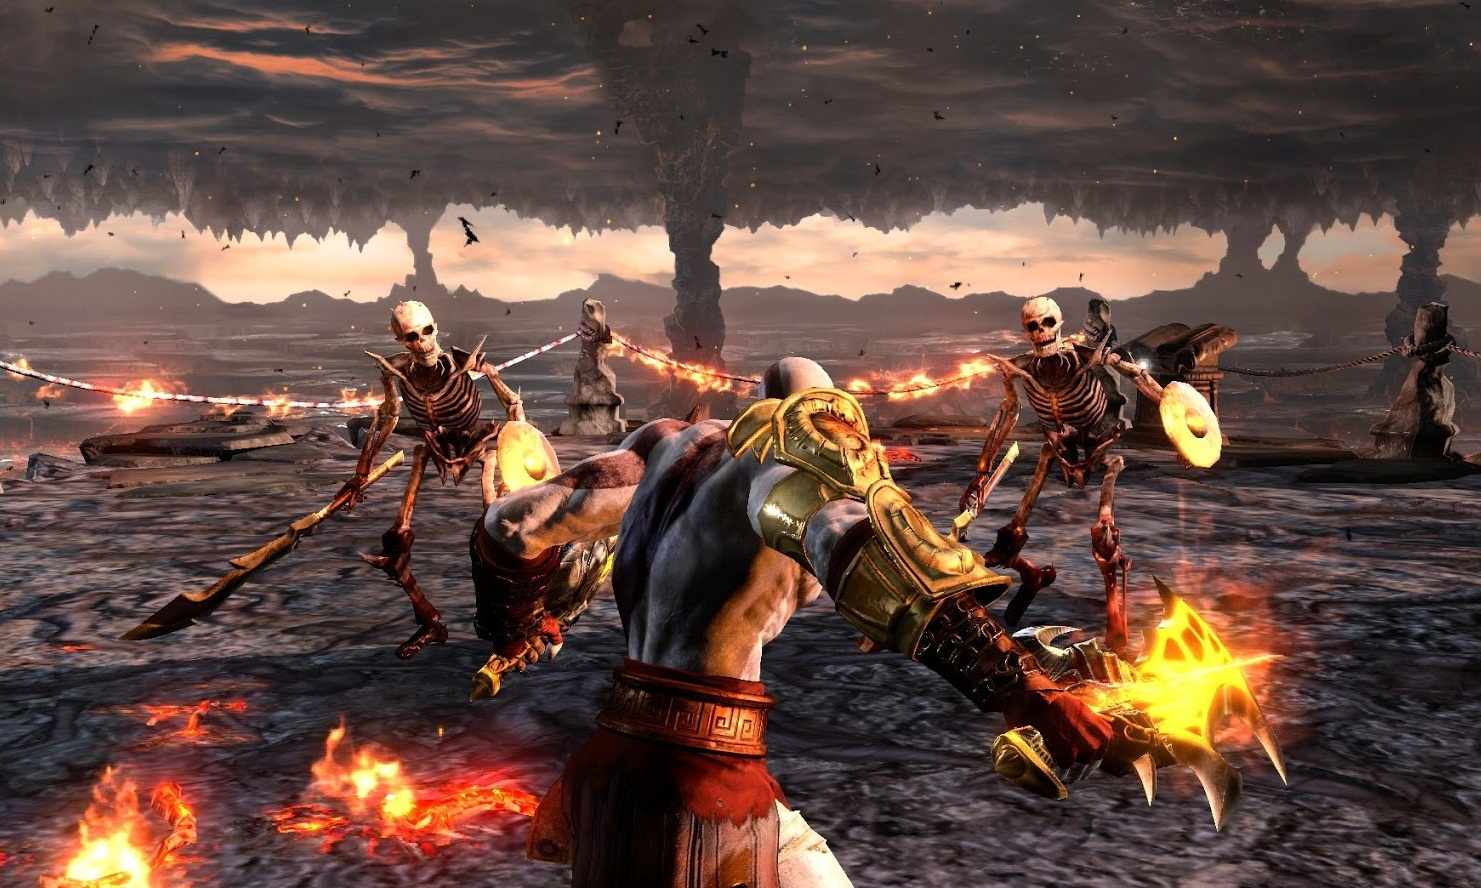 God of war 3 ps3 emulator setting 2017 youtube.